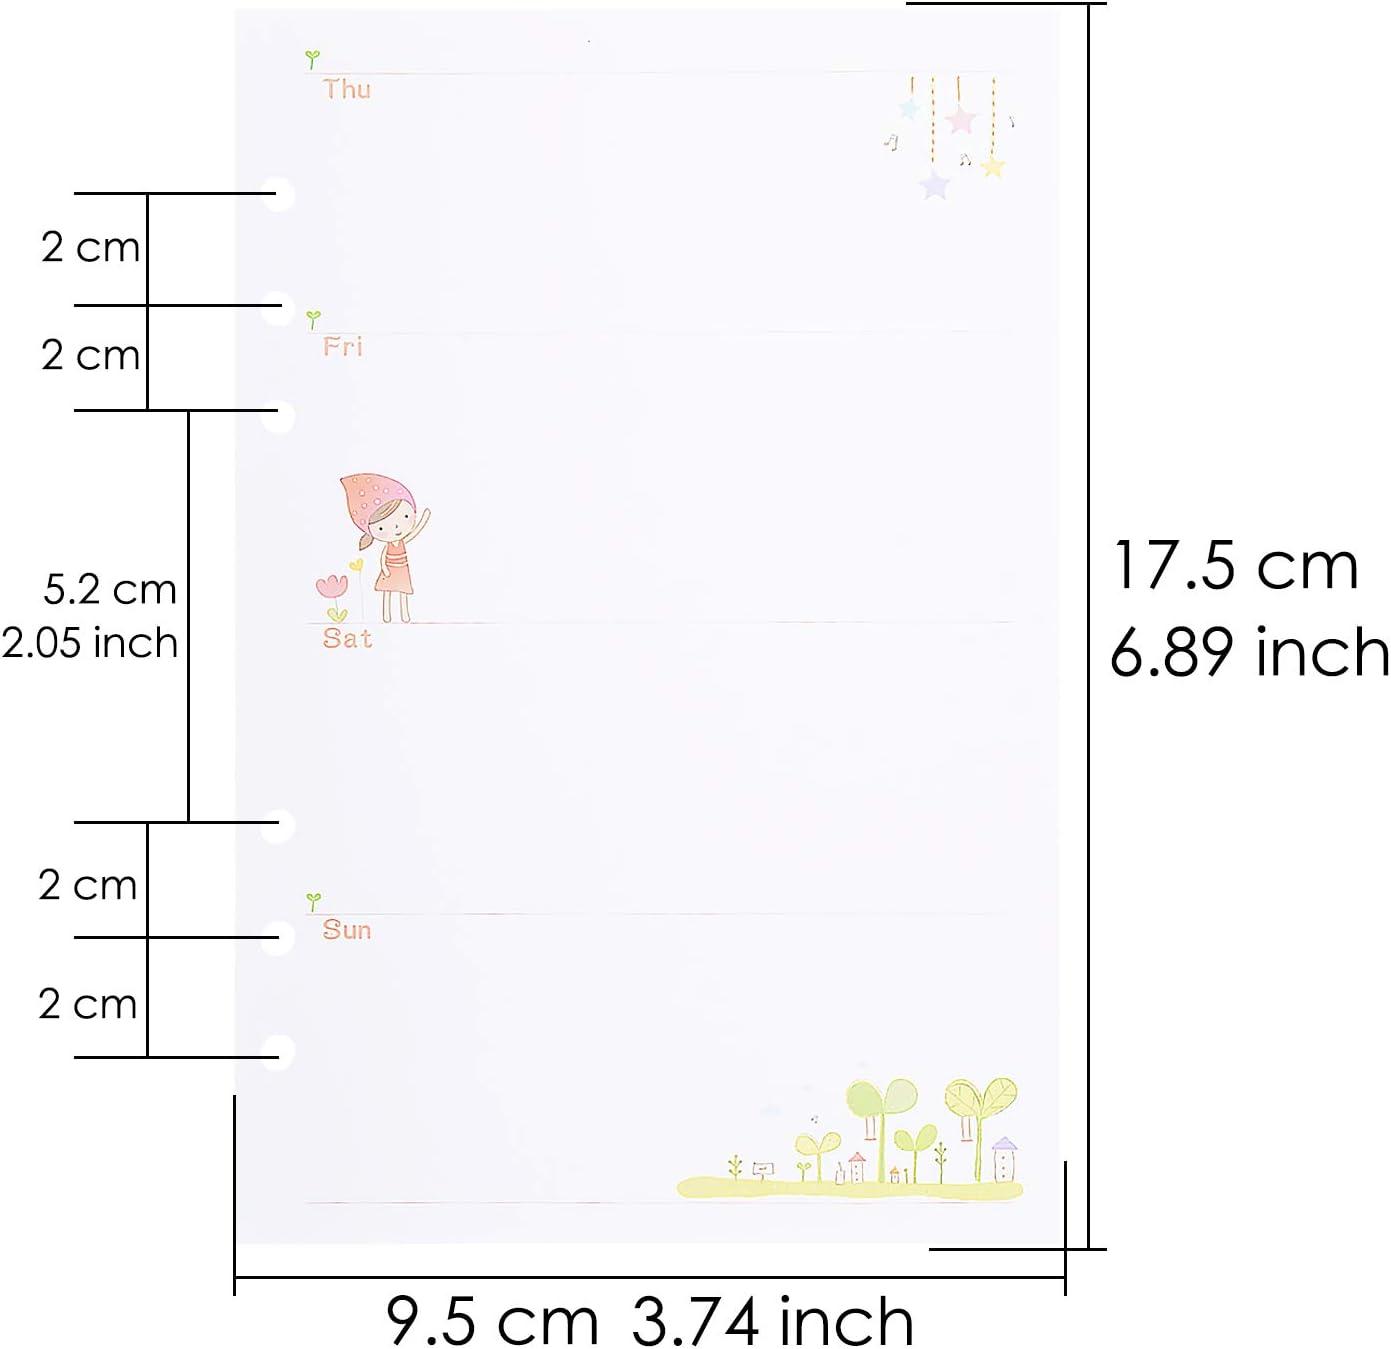 Cartone animato 90 pcs 6-Ring Journal Refills Lined Traveler Notebook Inserti in carta Allentata,21x14cm Larcenciel A5 Binder Refill Paper per Filofax